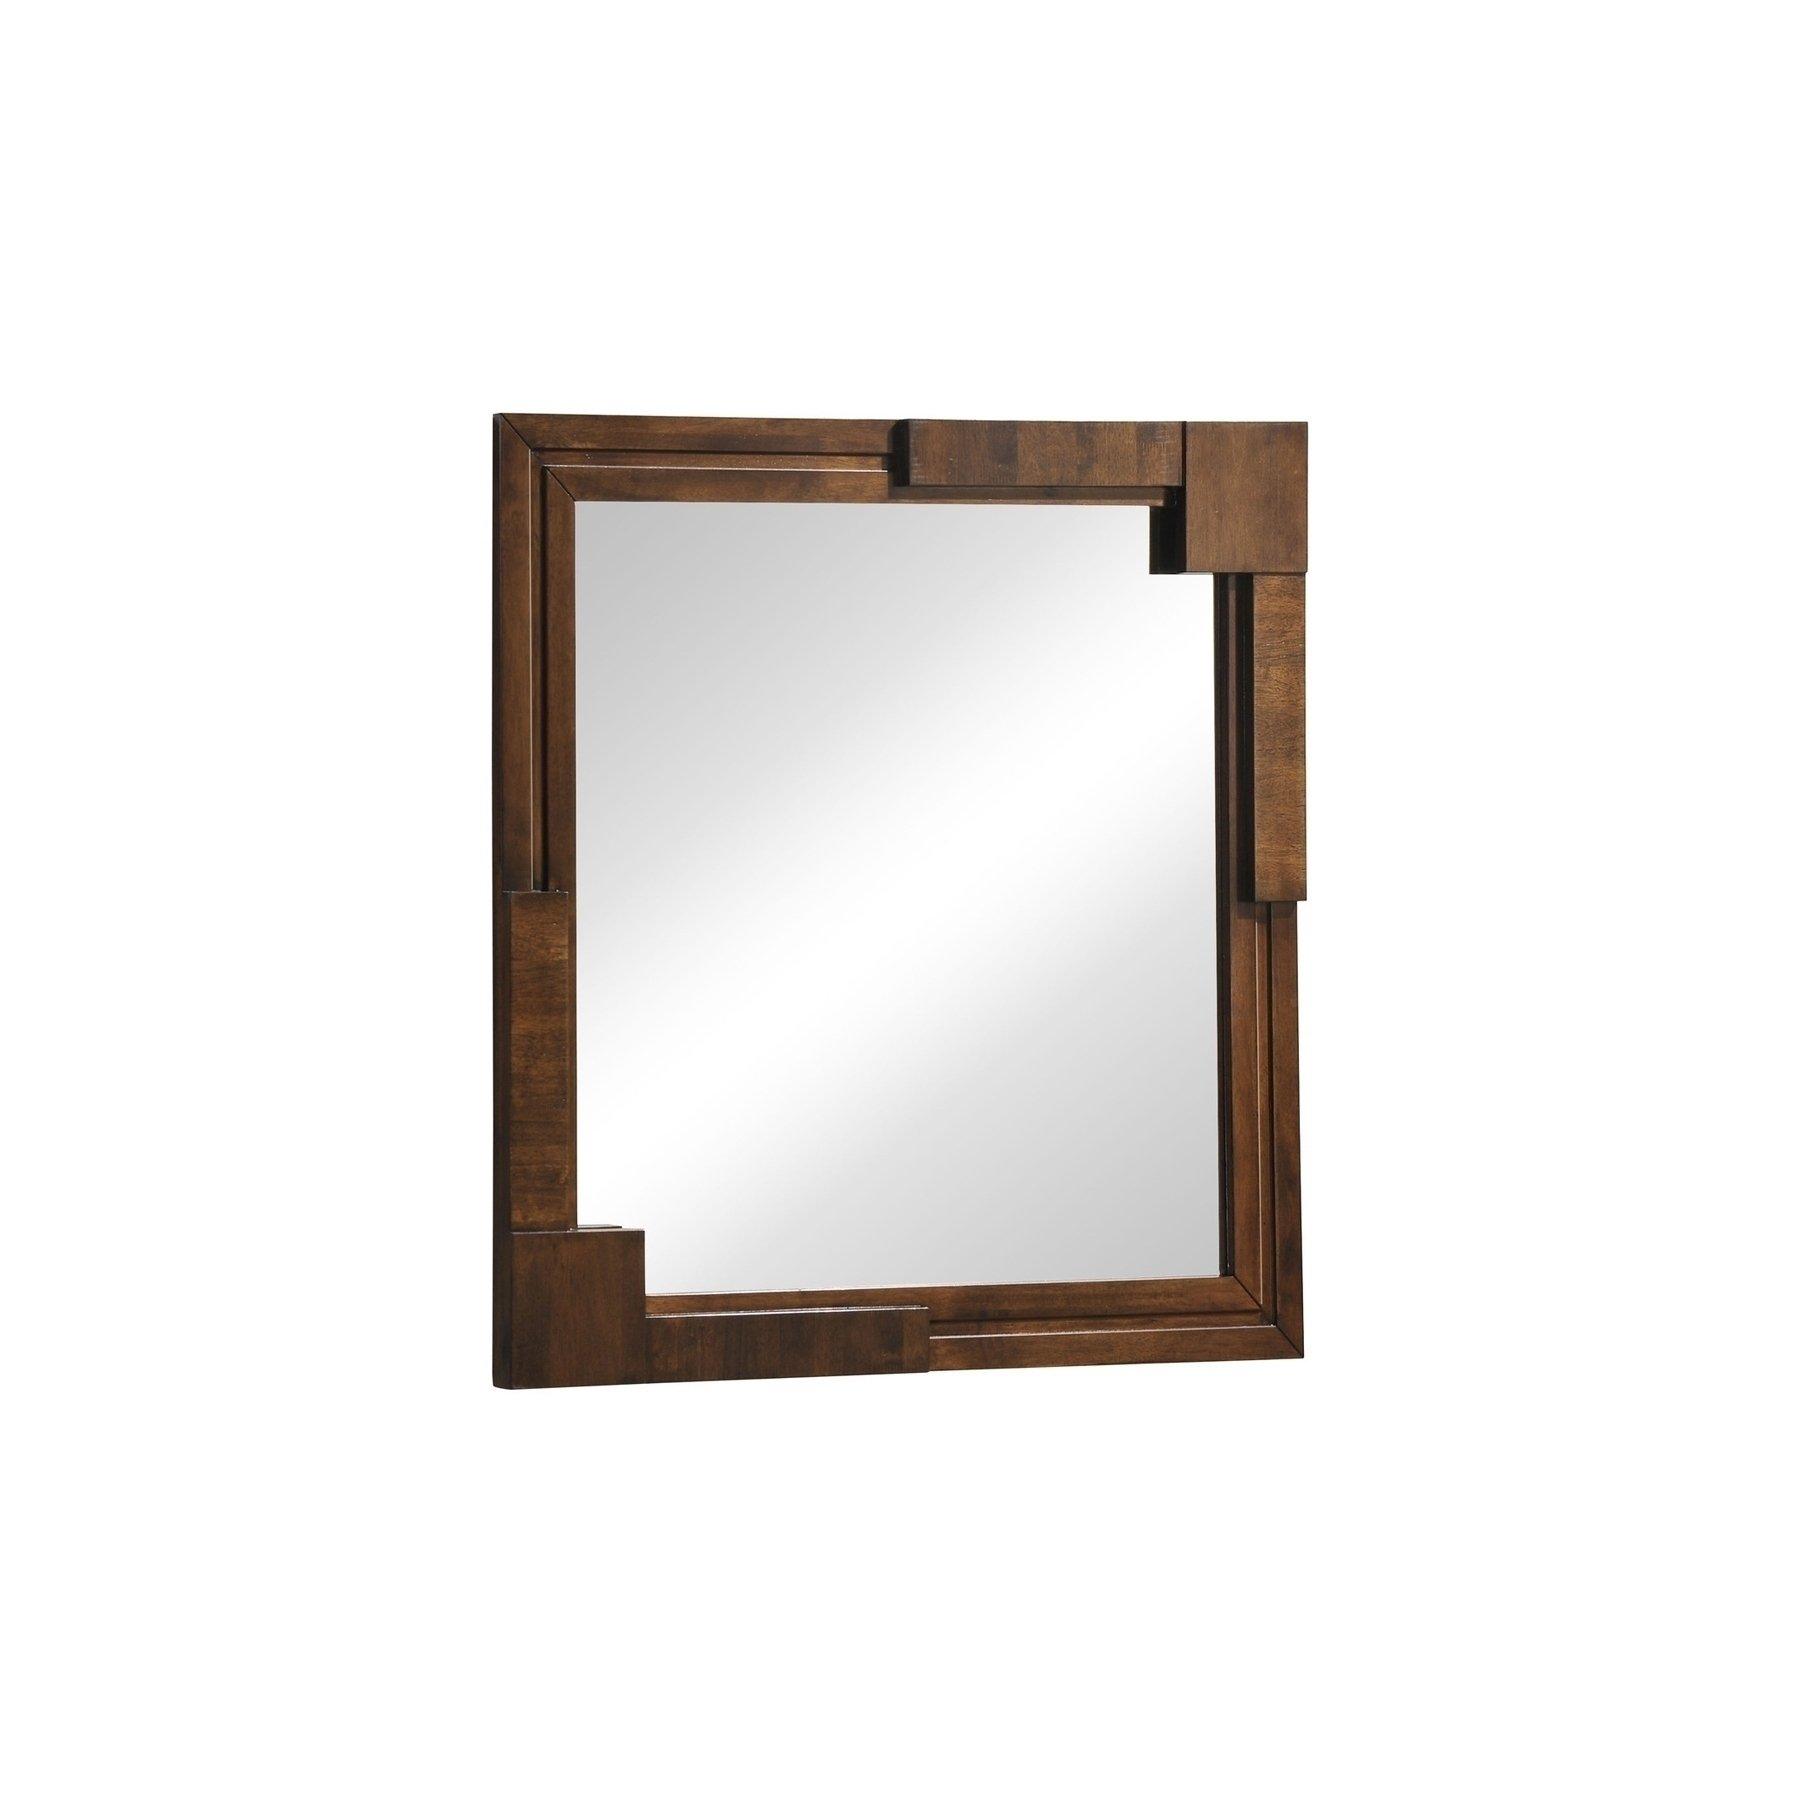 Barton | San Diego Mirror Furniture-Decor Accessories-Mirrors